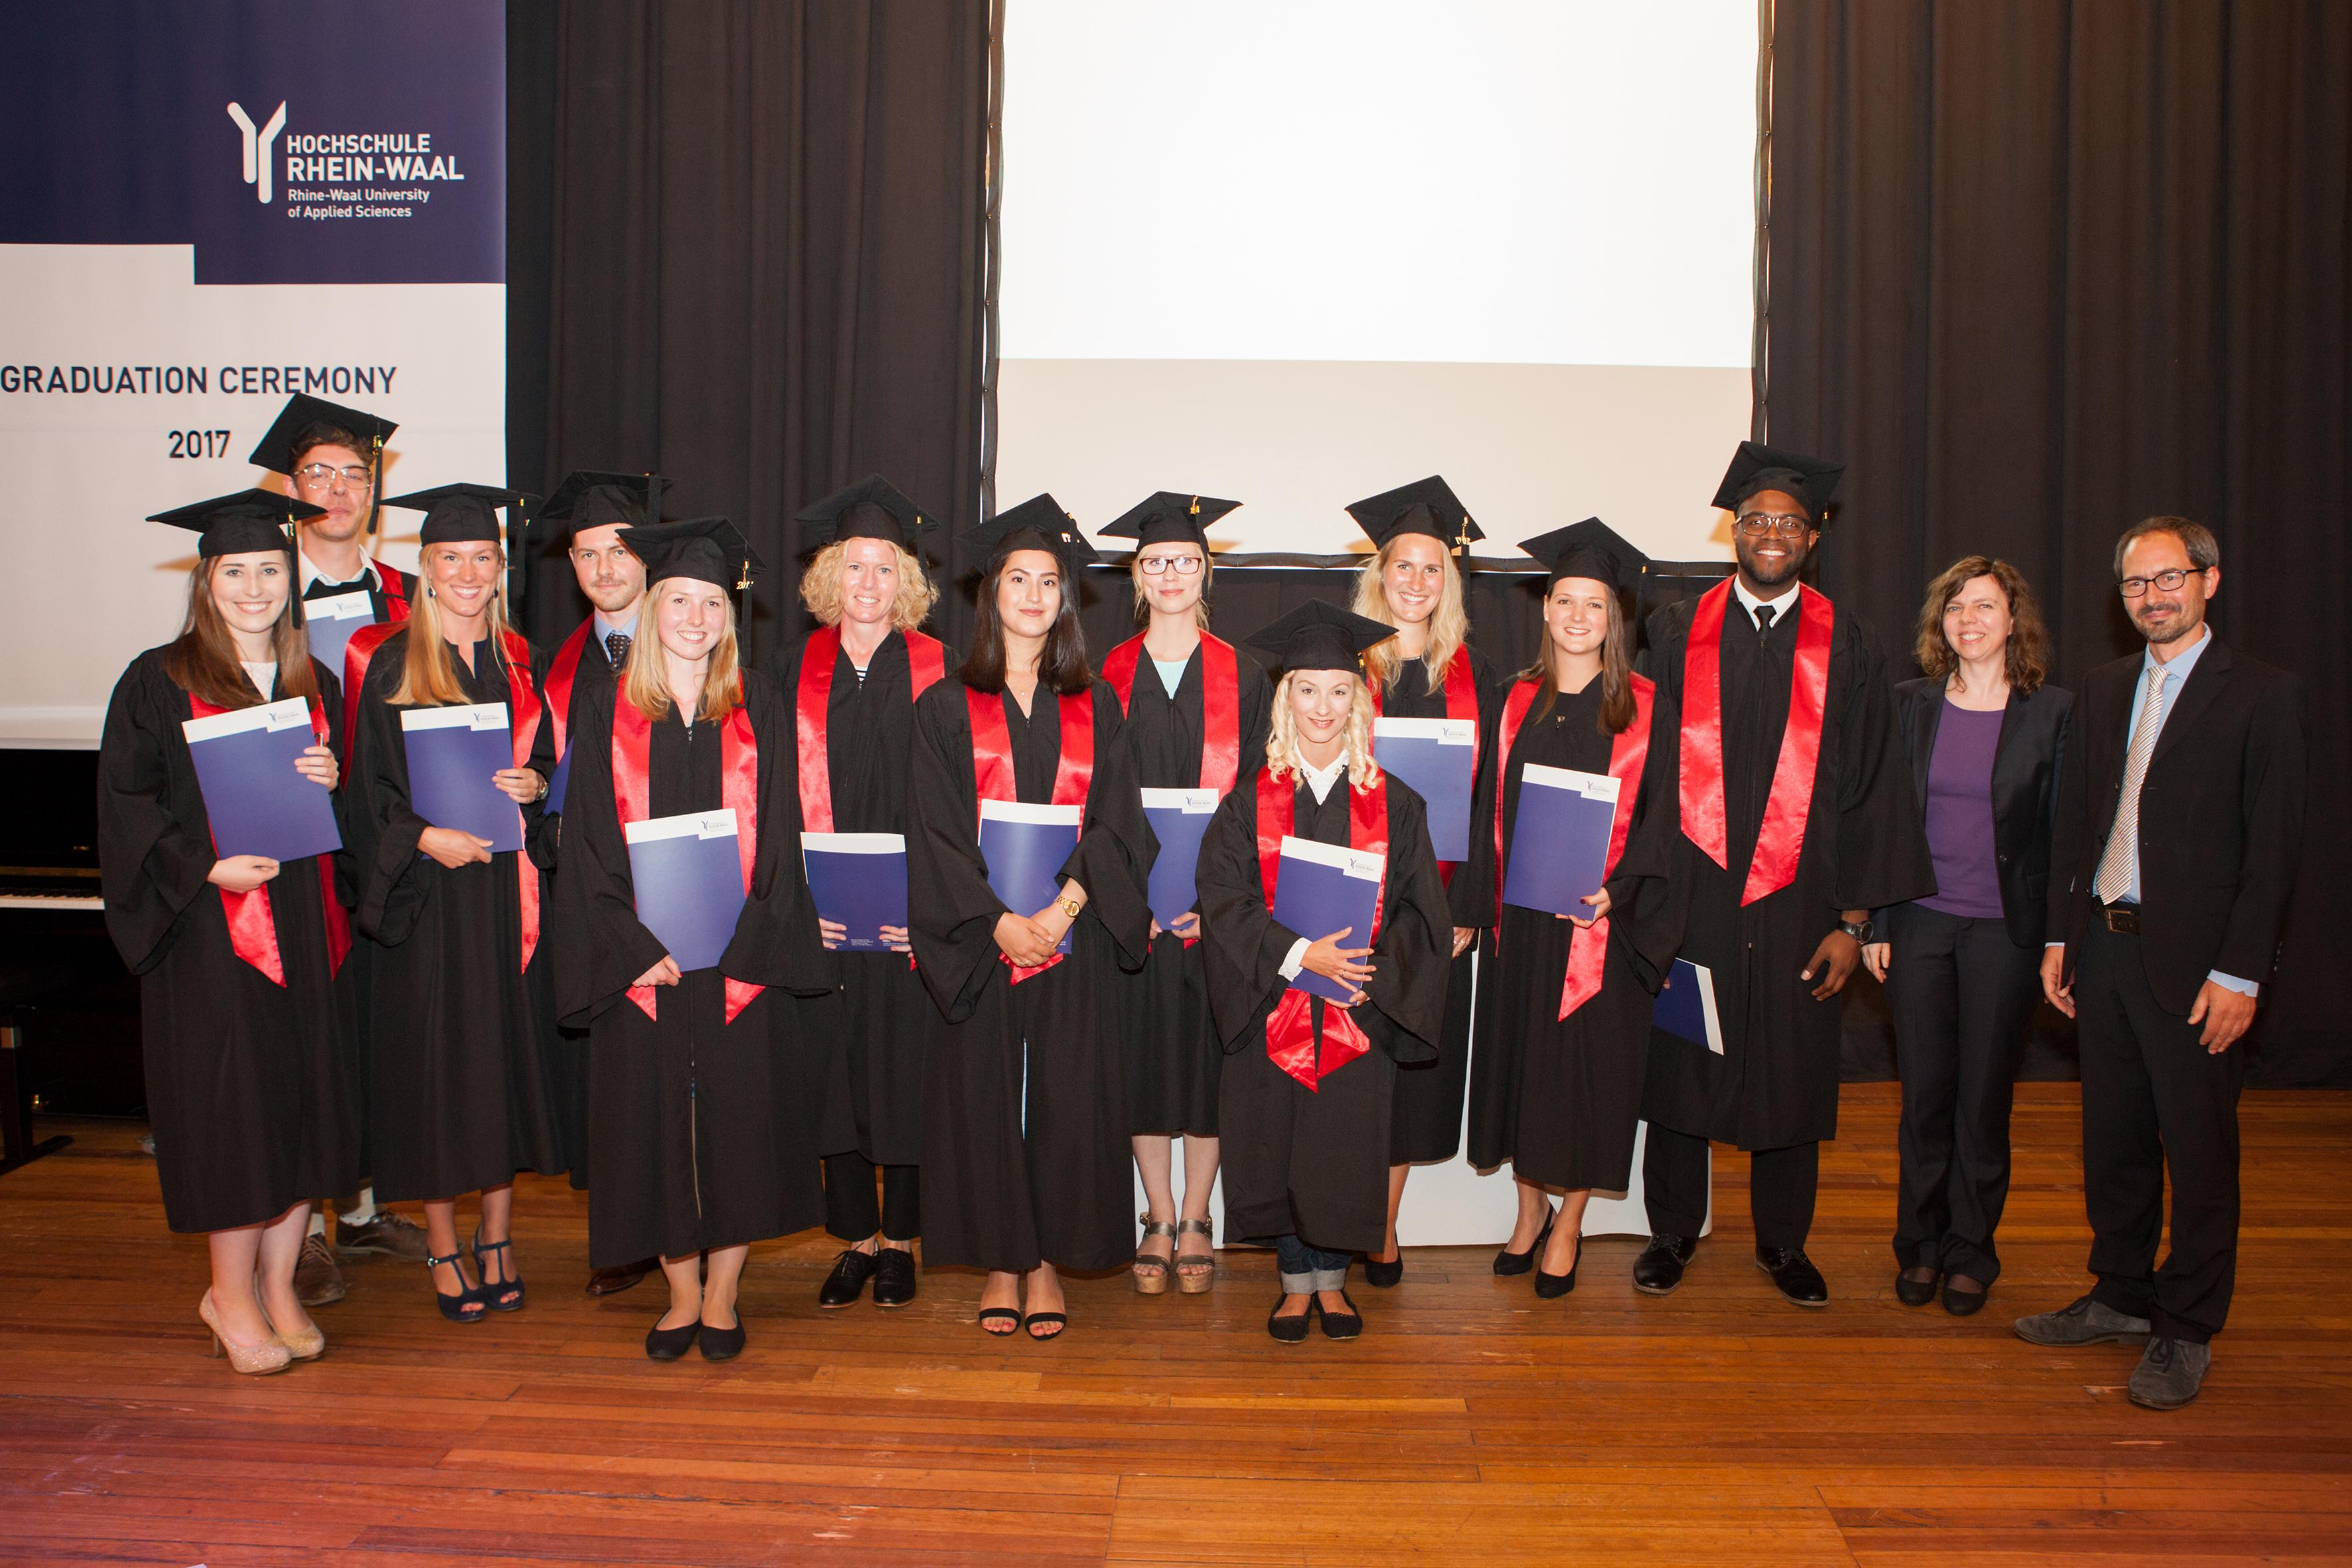 Graduation Ceremony 2017 At Rhine-Waal University Of